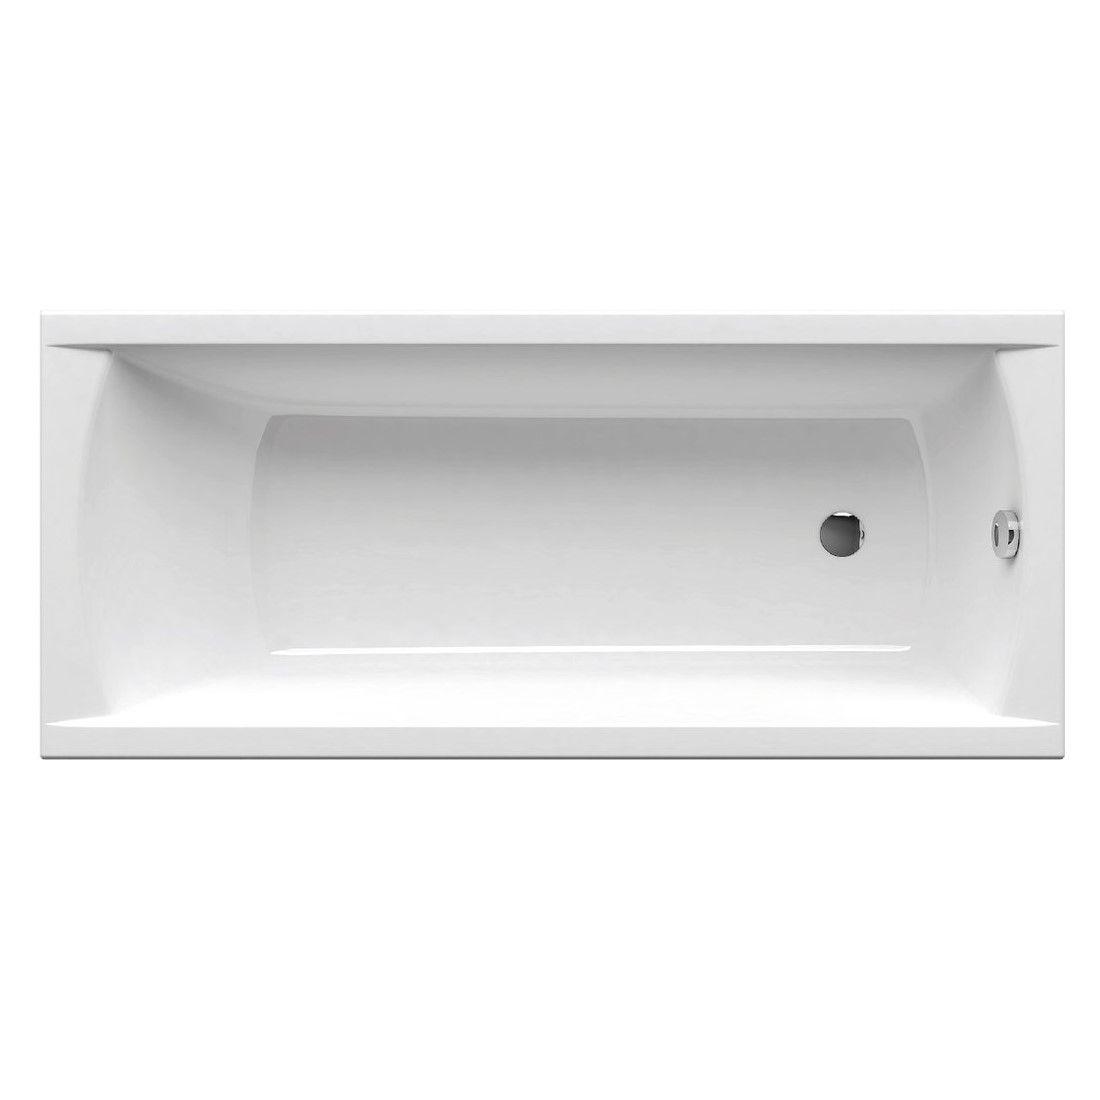 Прямоугольная ванна Ravak Classic 170x70 ФОТО